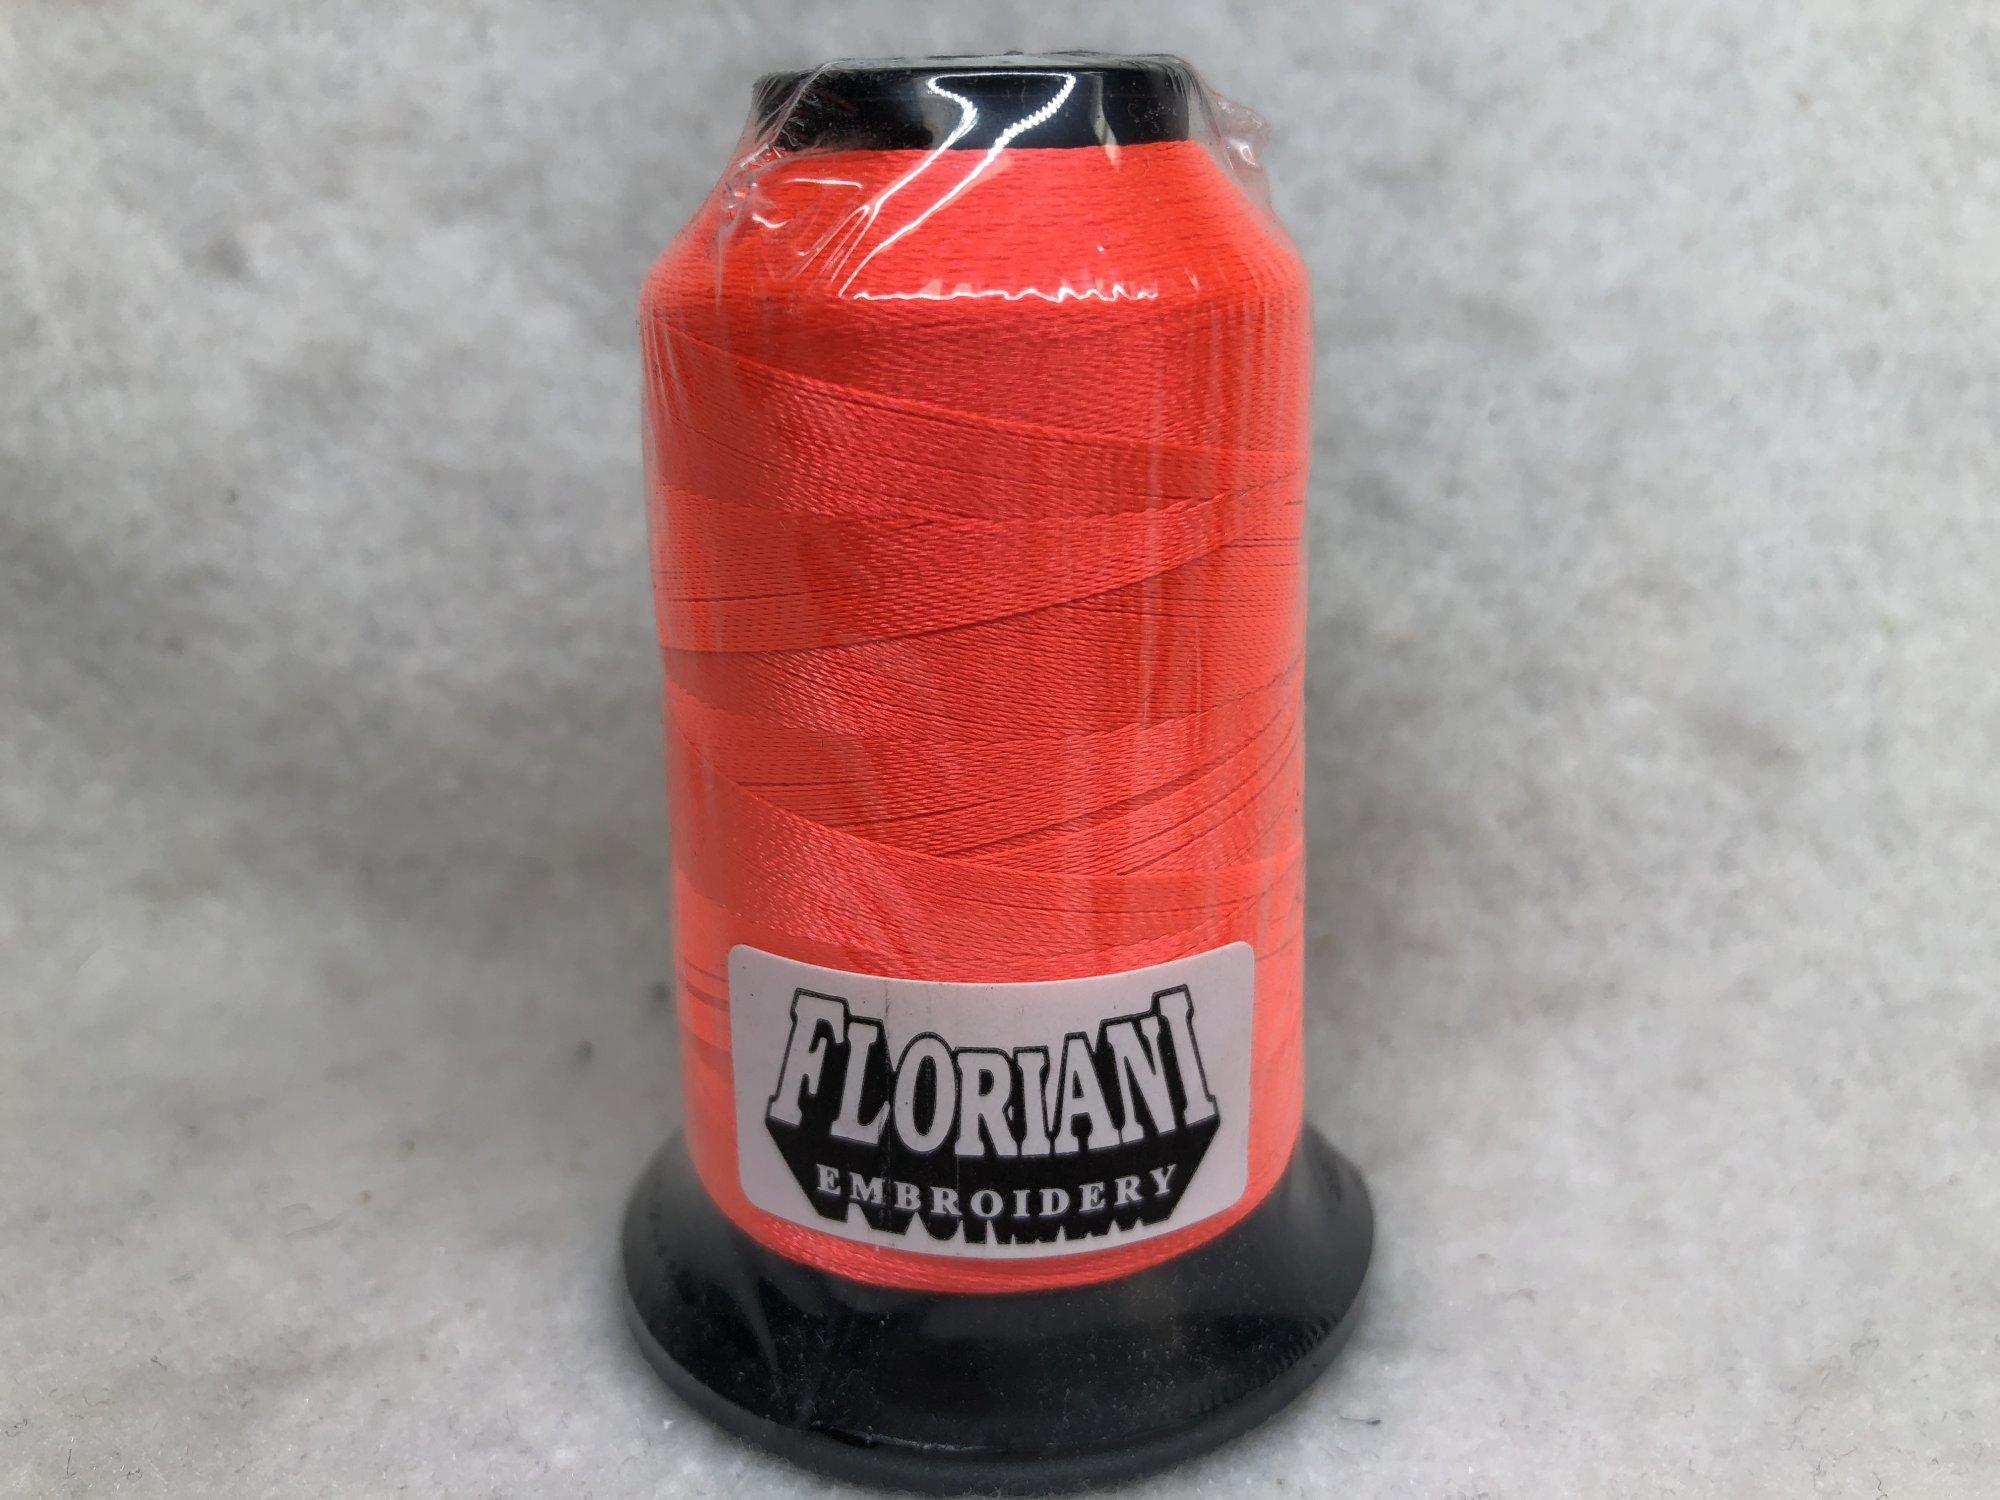 FLORIANI PF0002 FIREFLY Reg $5.95 29% Off = $4.20